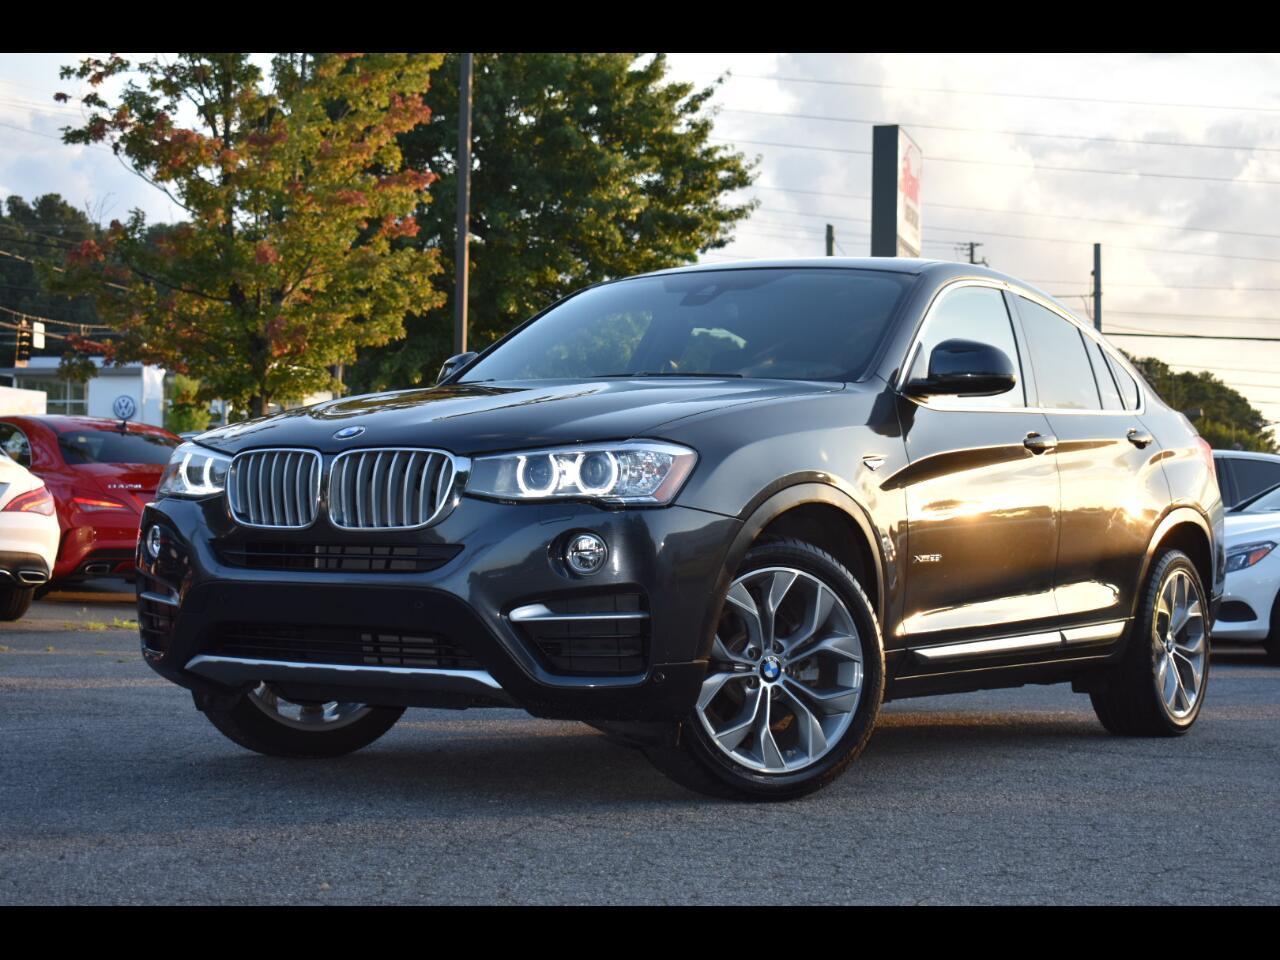 BMW X4 XDrive28i 4D SAC 2018